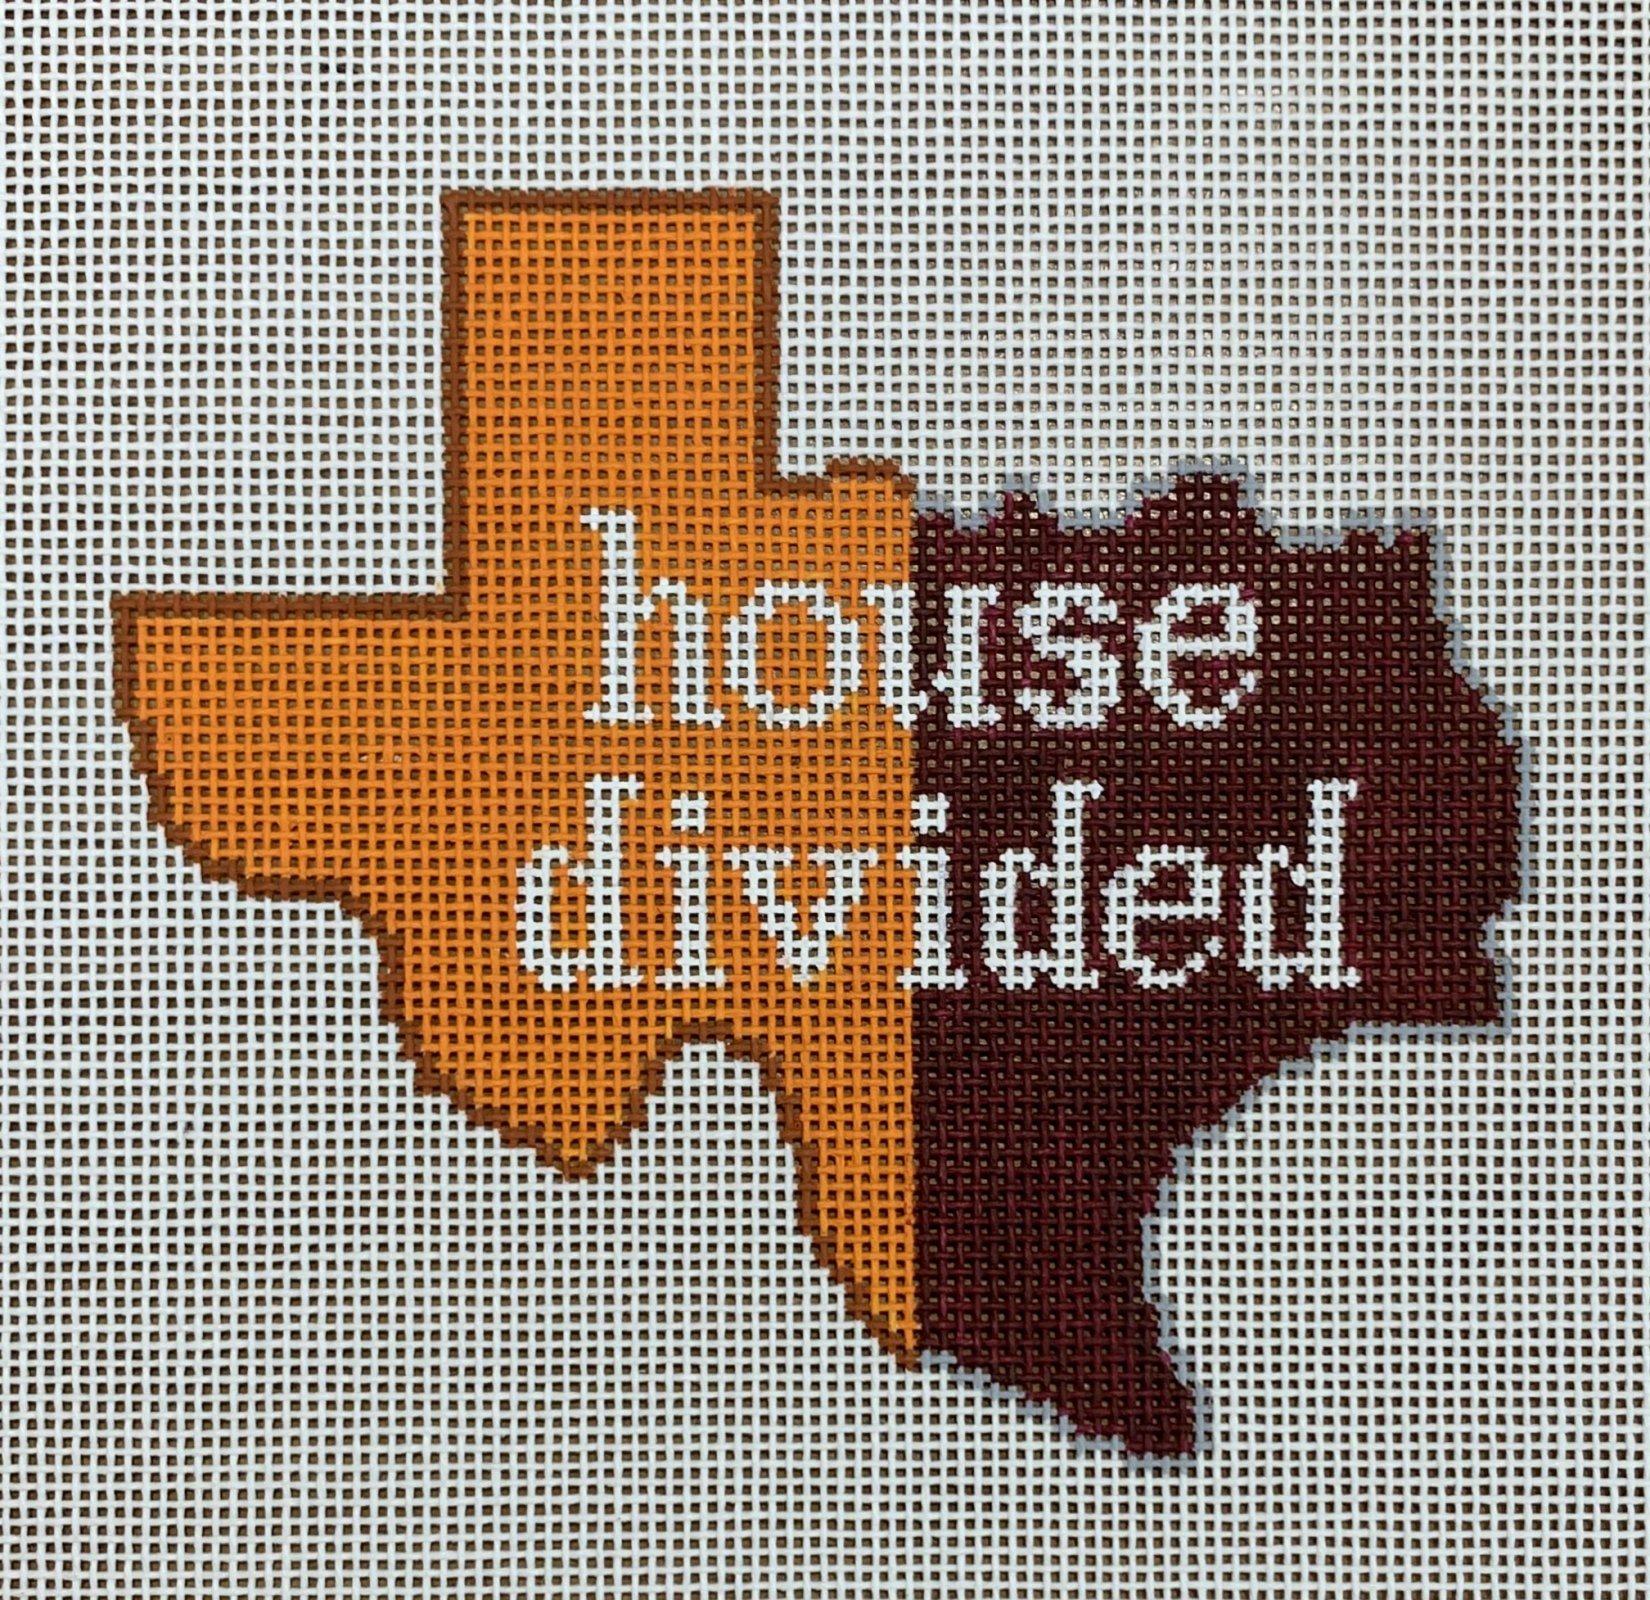 House Divided - UT/A&M